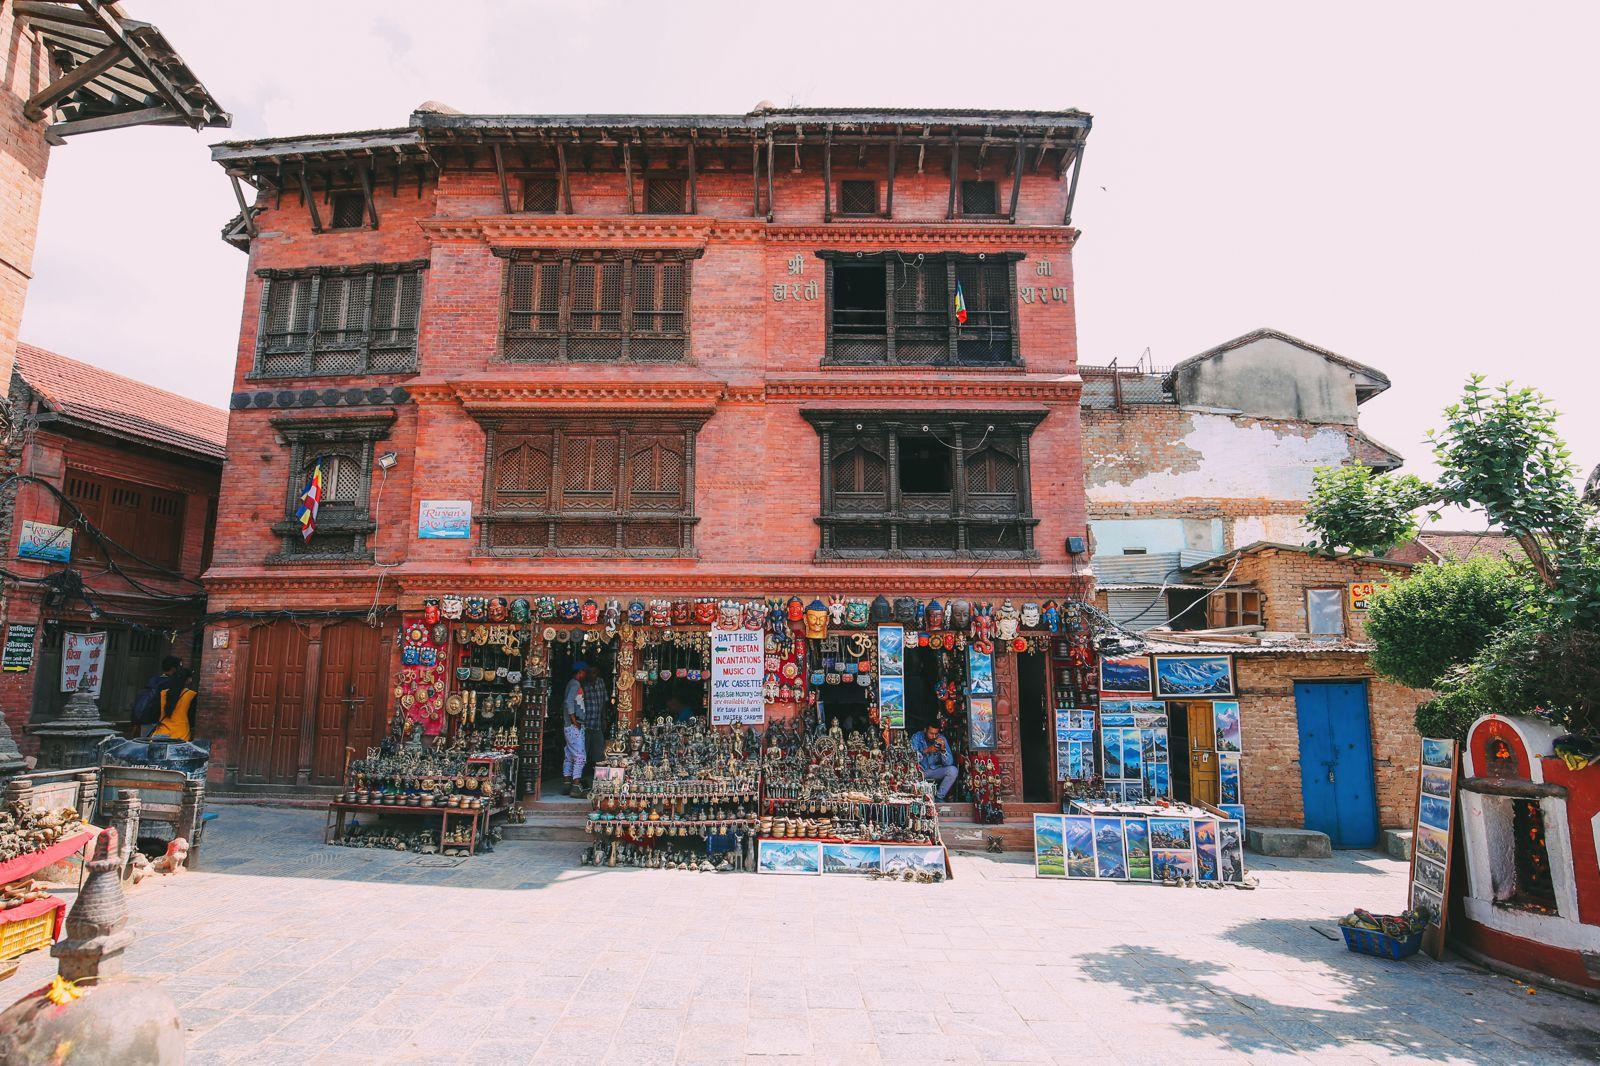 Exploring Swayambhunath Stupa - The Monkey Temple In Kathmandu, Nepal (8)